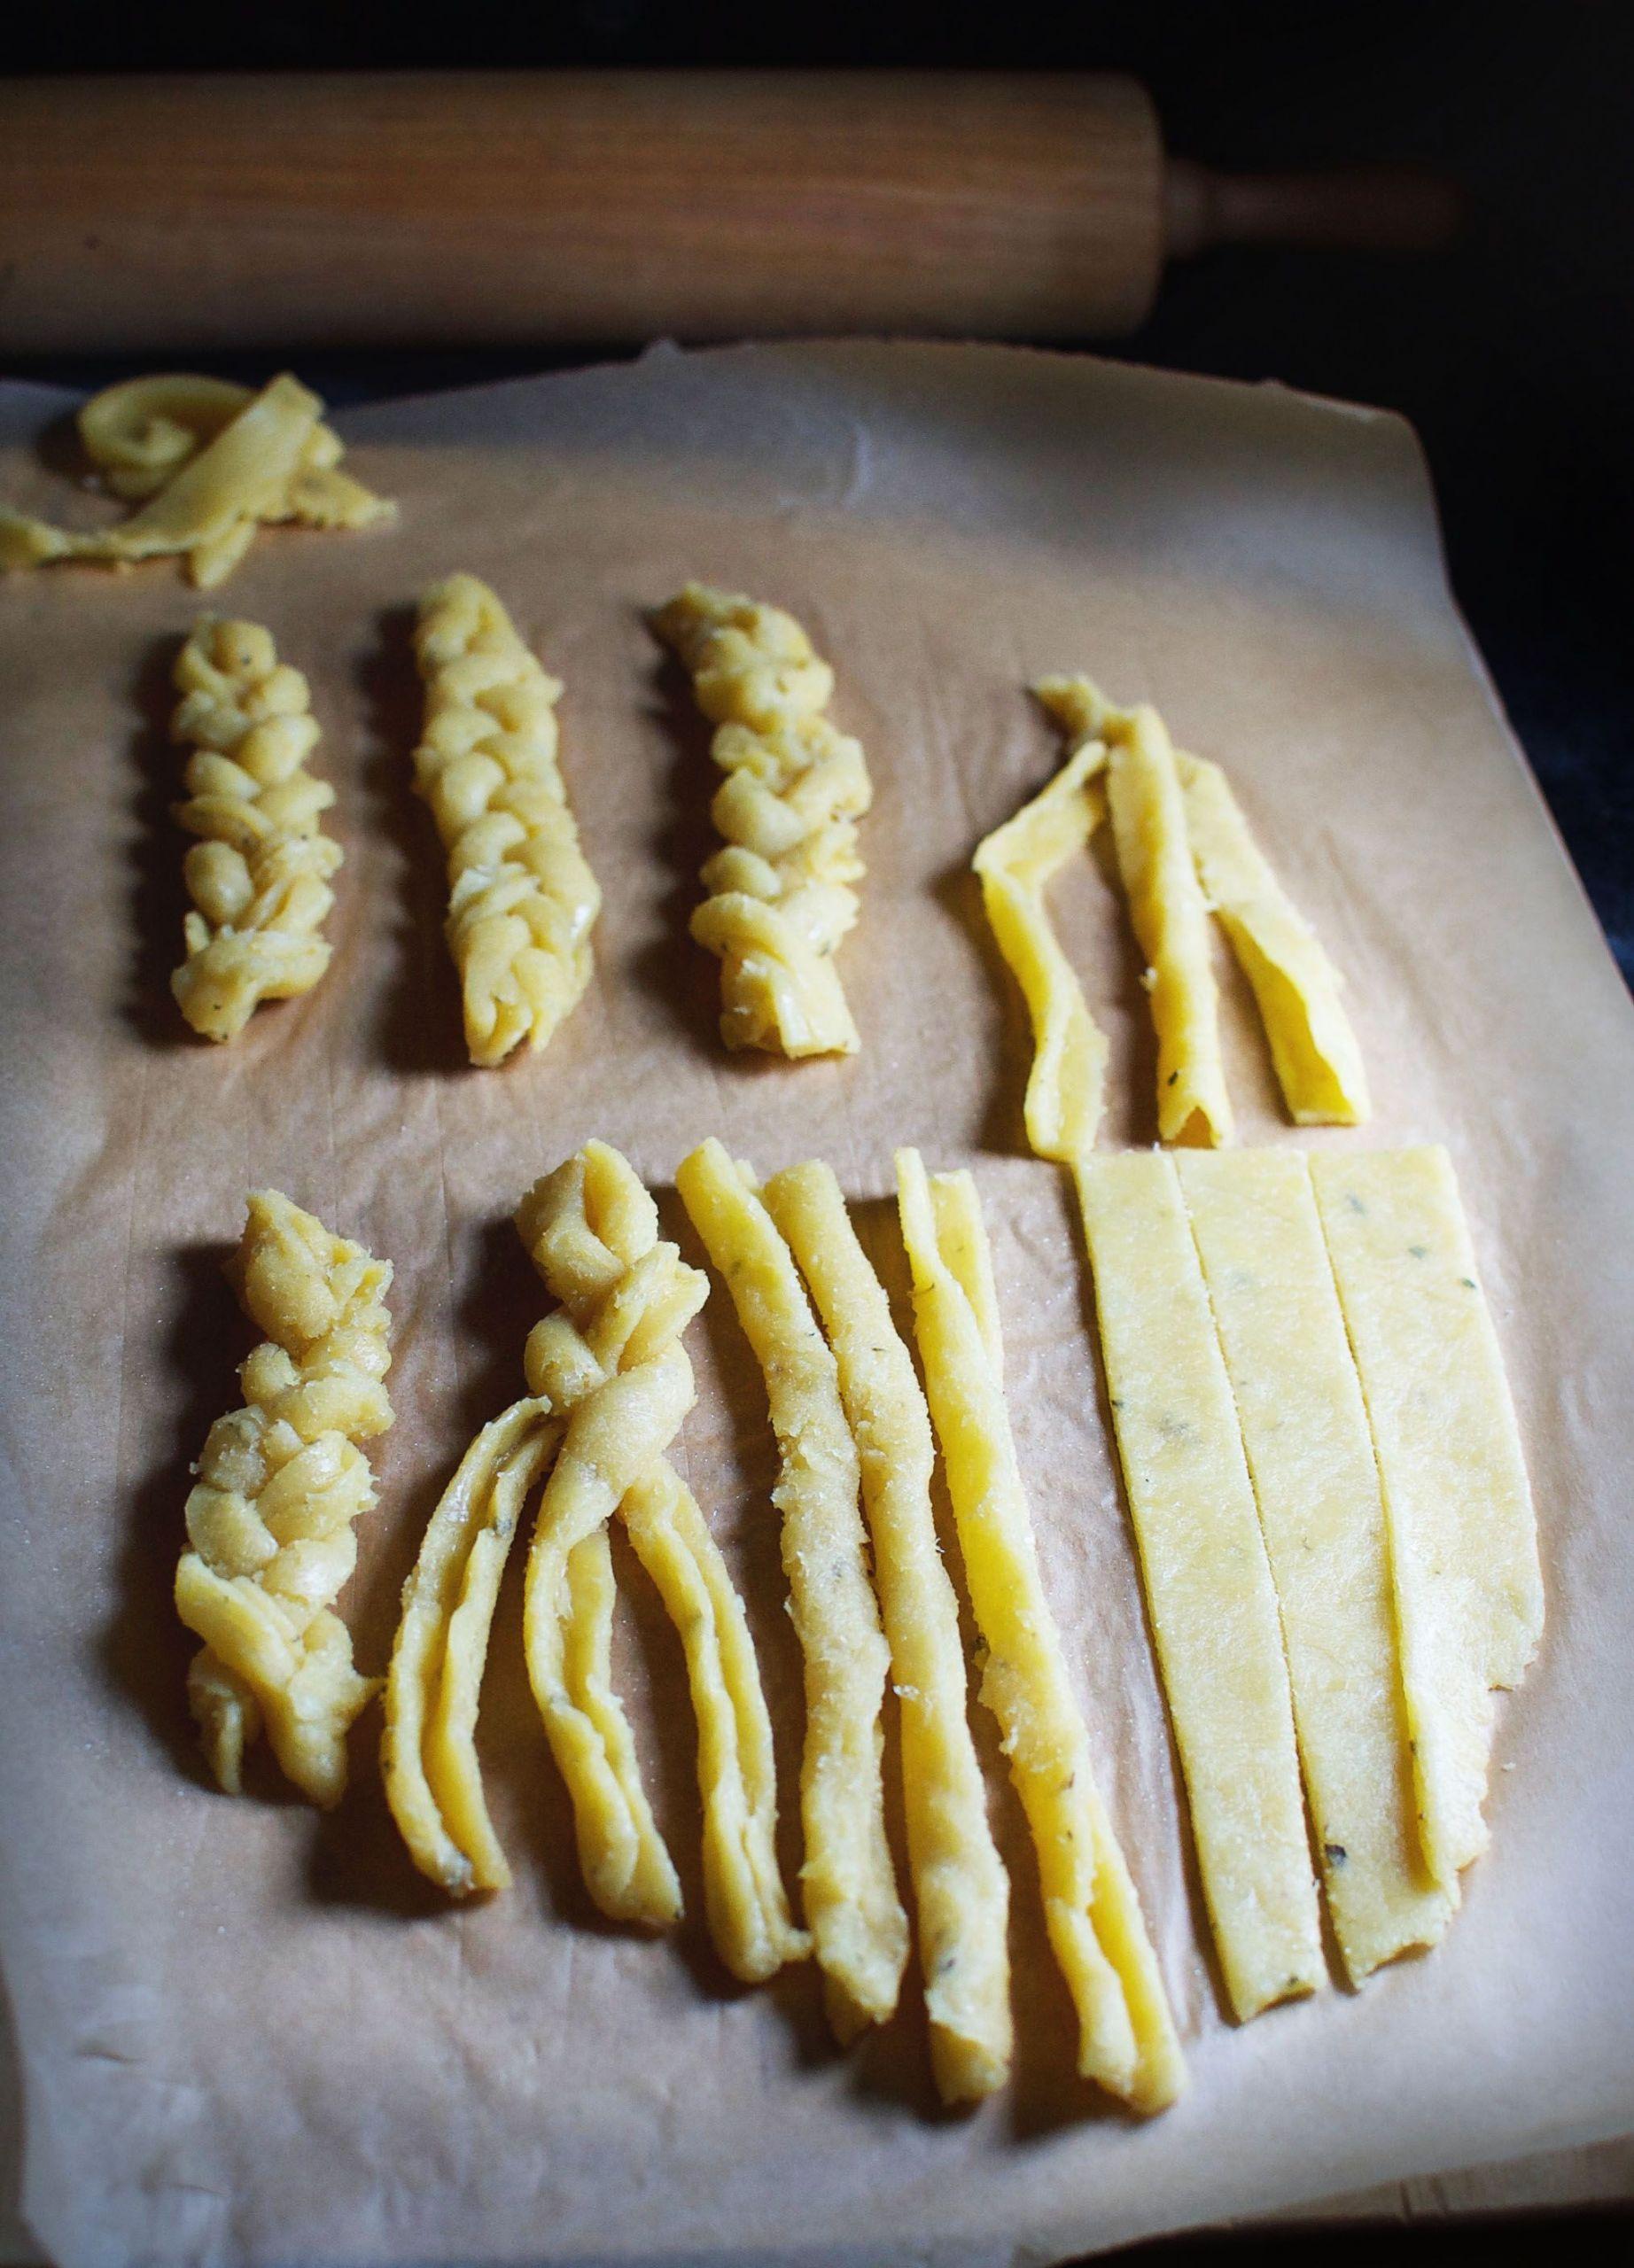 Low Carb Bread Sticks Garlic Breadsticks  Low Carb Braided Garlic Breadsticks Recipe